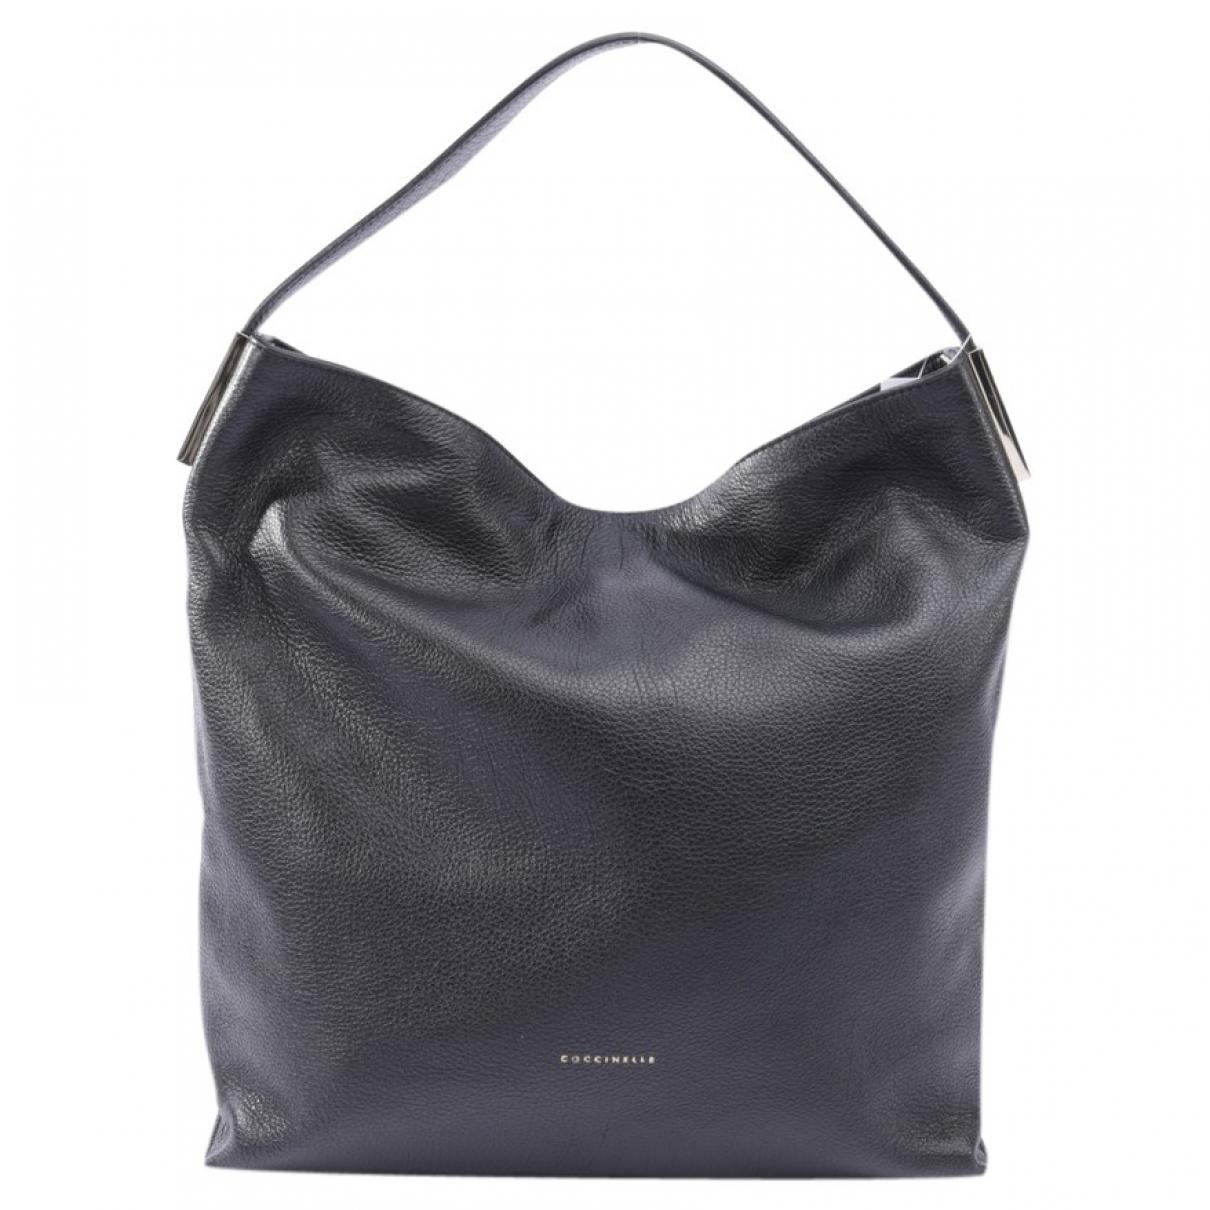 Coccinelle \N Black Leather handbag for Women \N